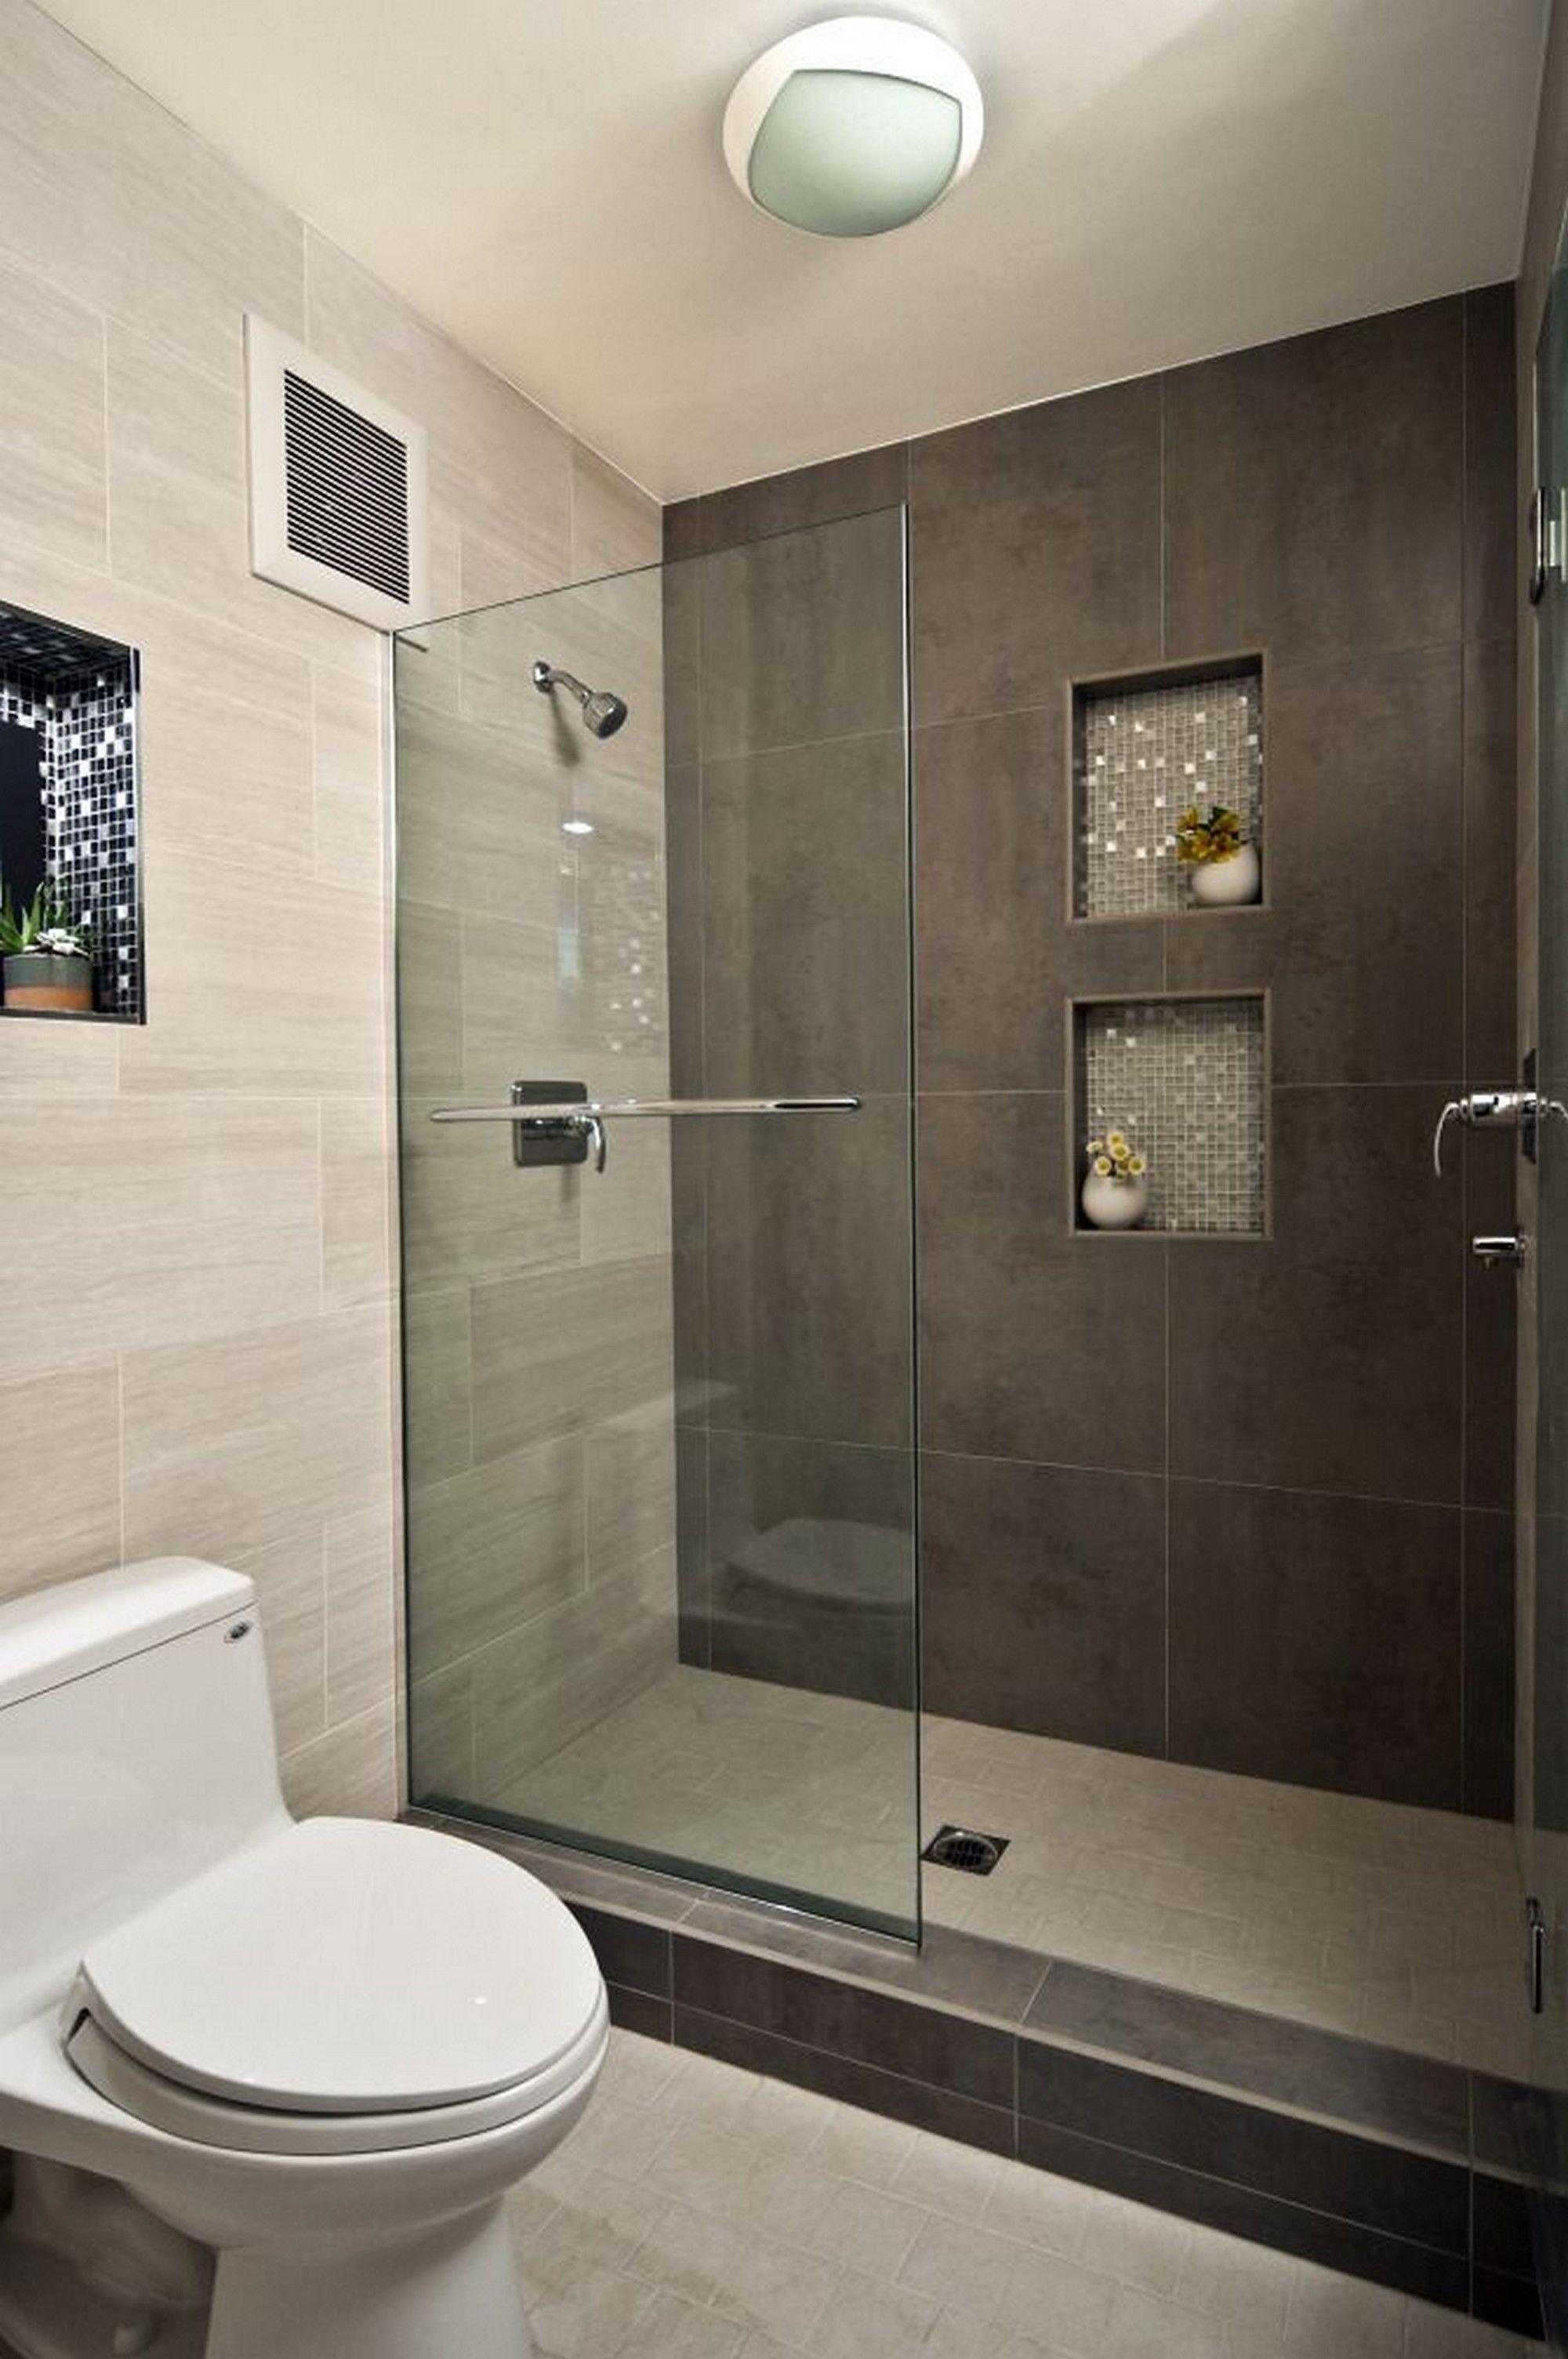 10 Spectacular Bath Ideas For Small Bathrooms modern bathroom design ideas with walk in shower small bathroom 3 2020